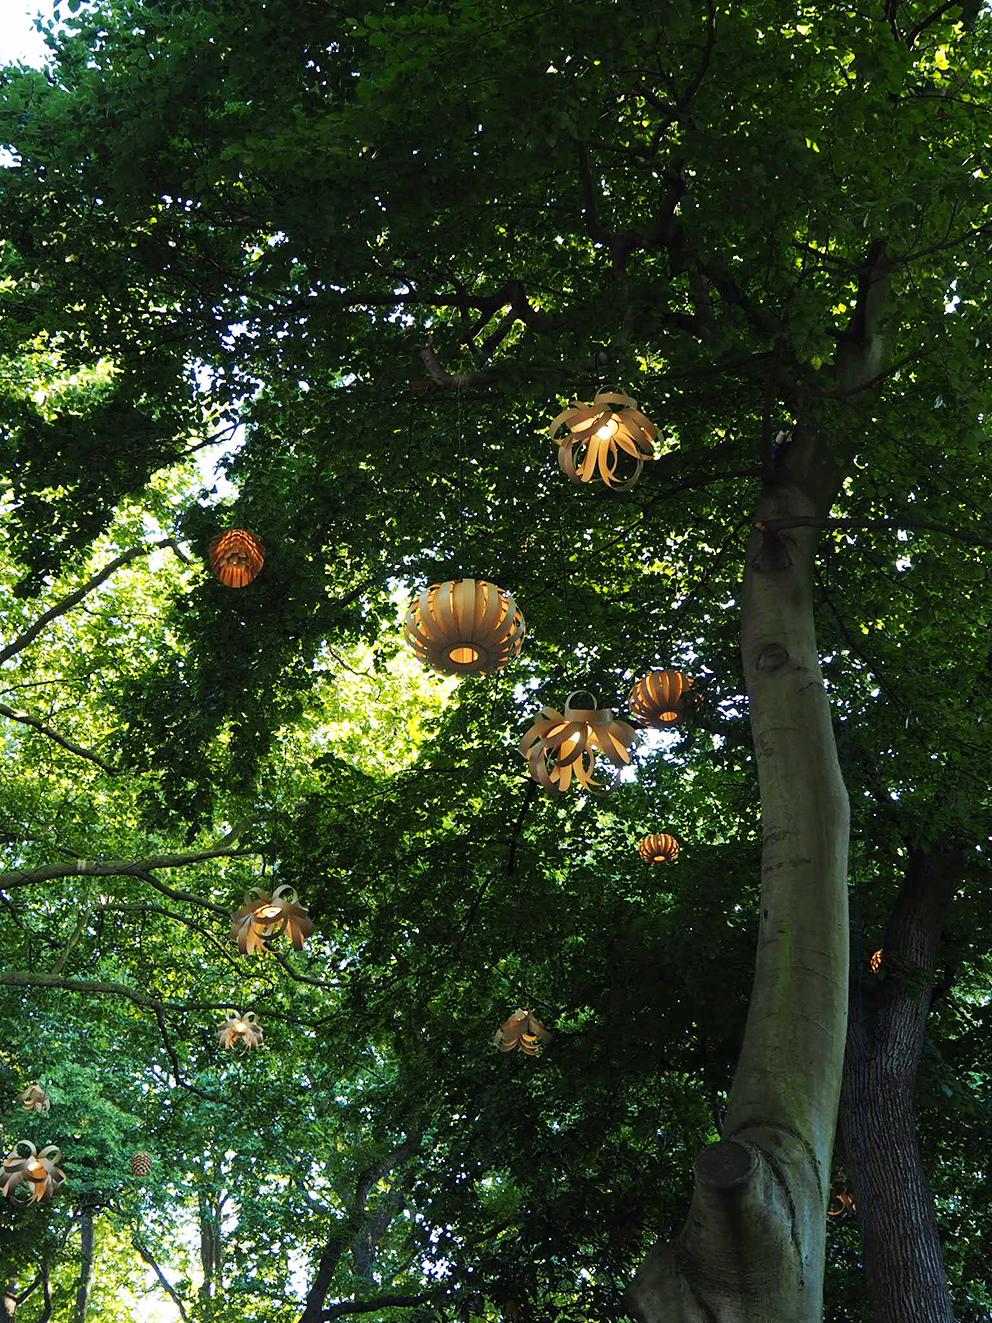 French For Pineapple Blog - RHS Chelsea Flower Show 2017 - Tom Raffield Lights In Trees At Dusk